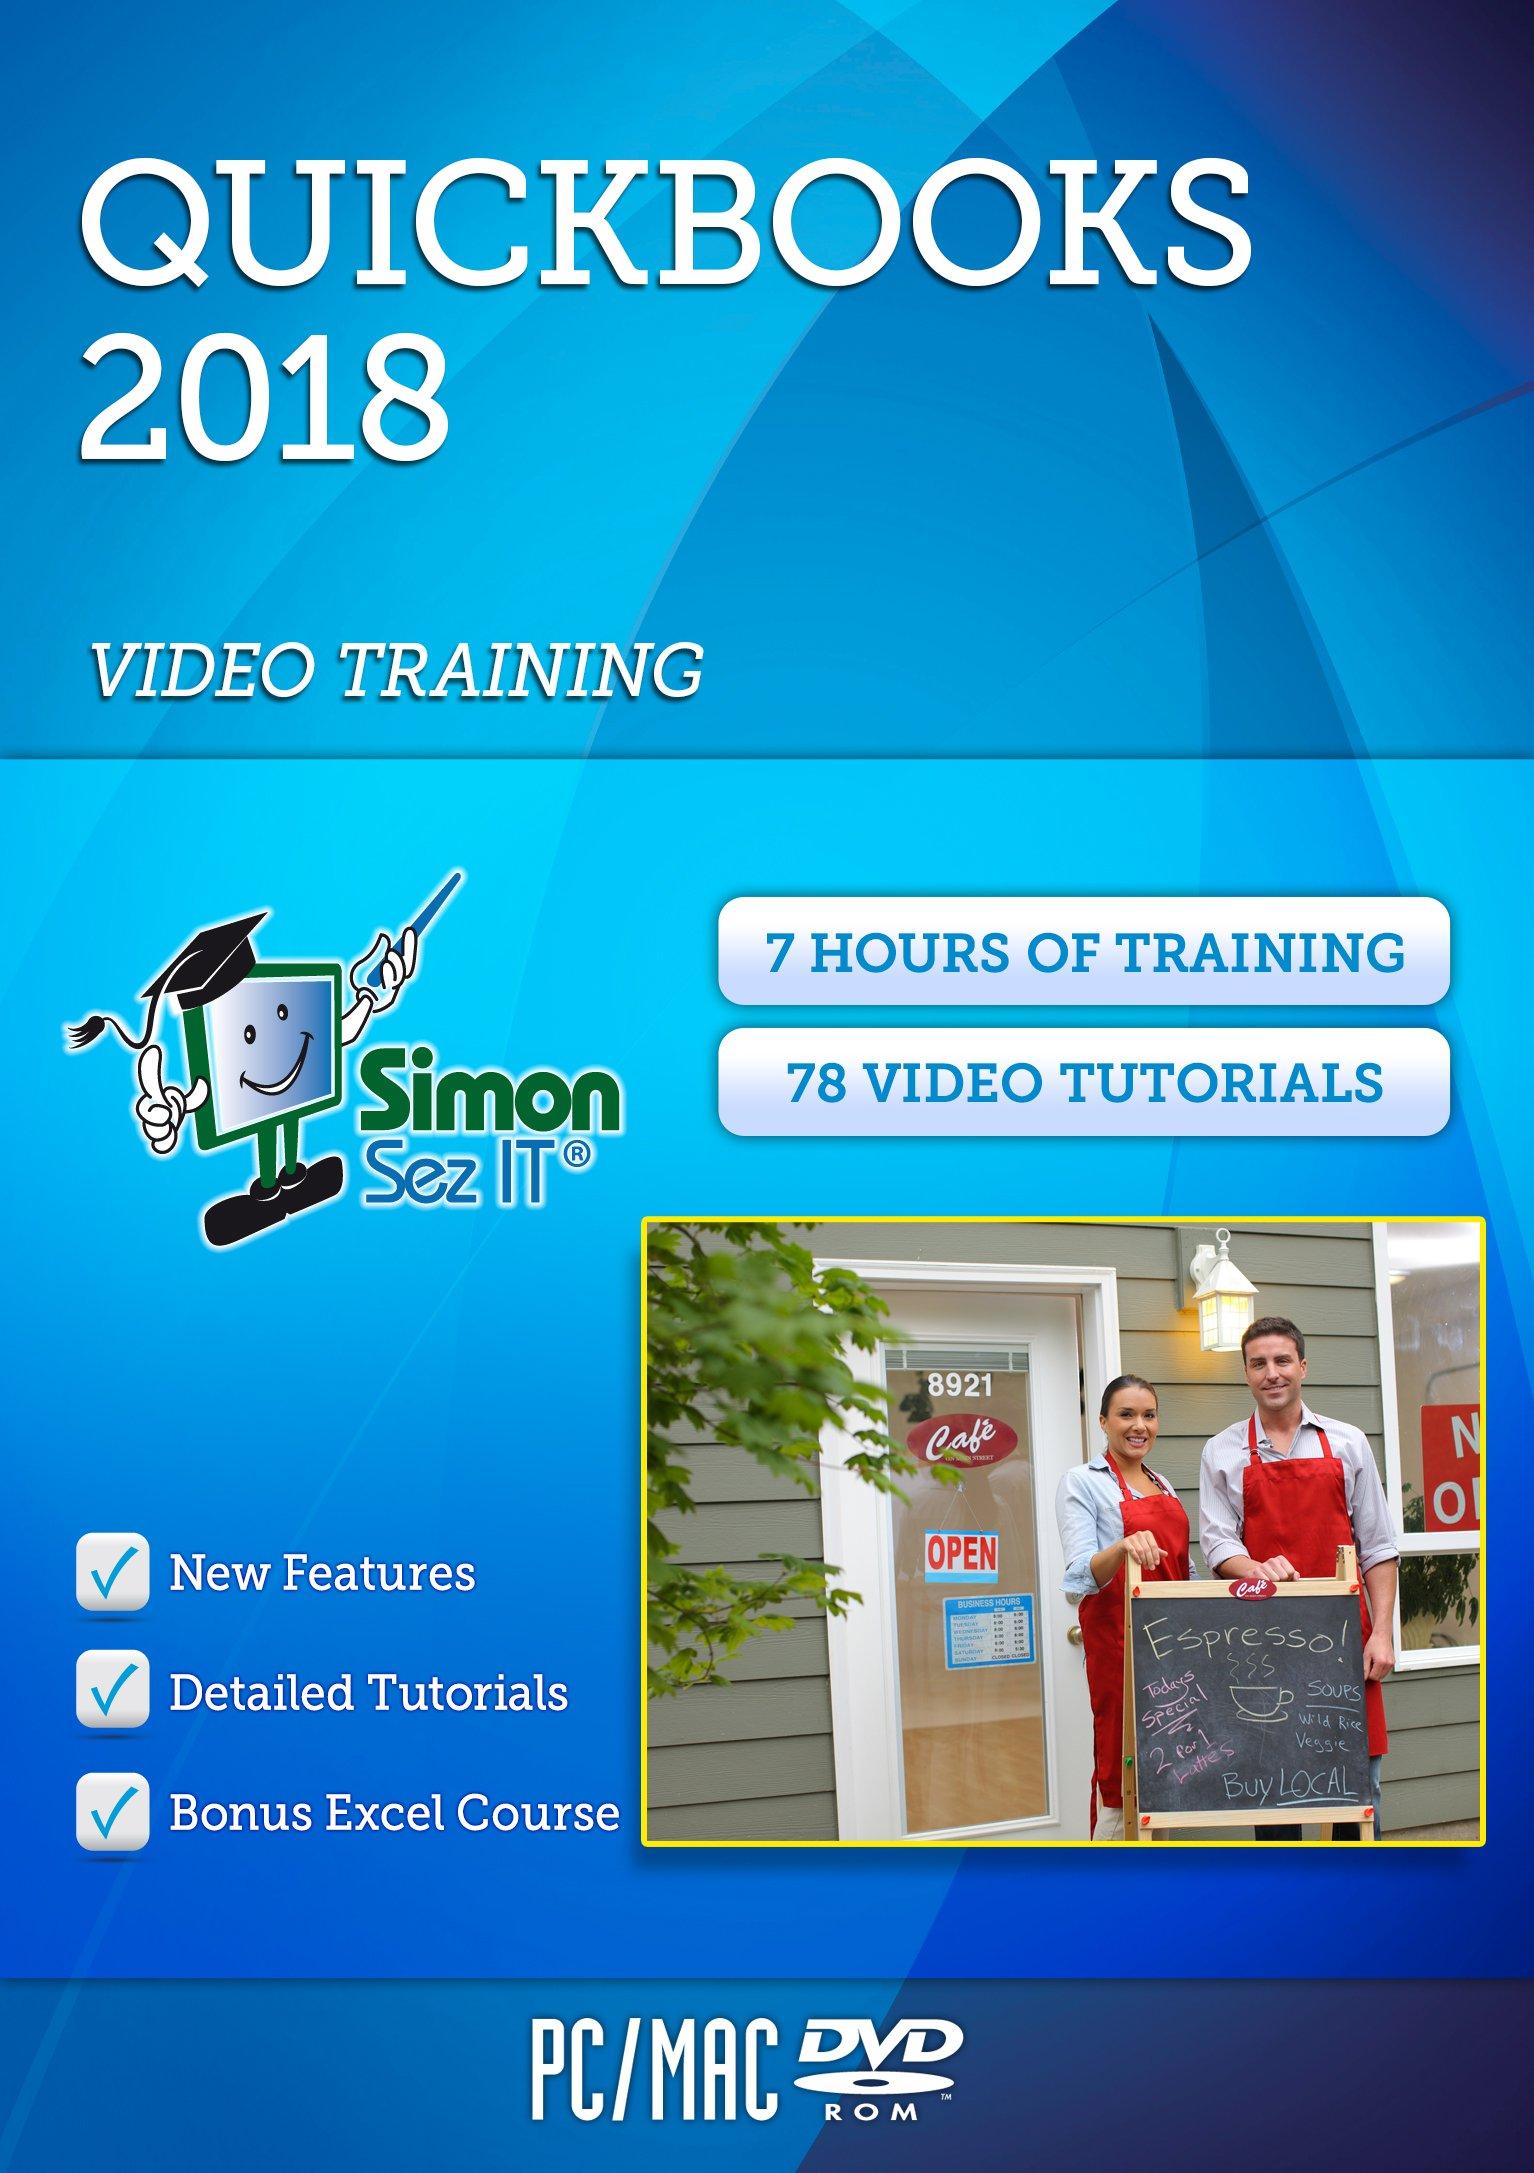 Master QuickBooks® 2018 Training Course by Simon Sez IT